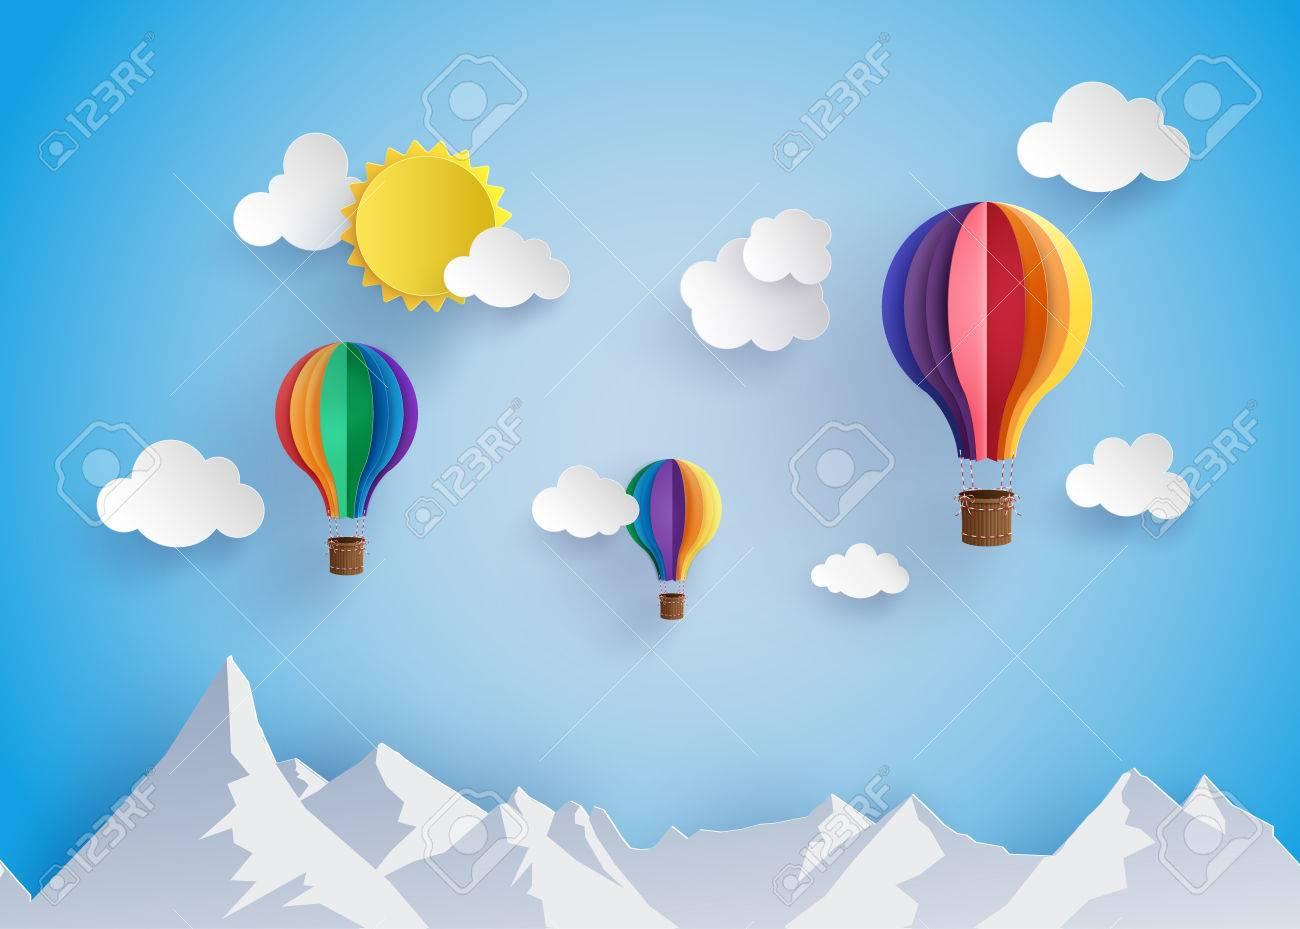 Origami made colorful hot air balloon flyin over moutain with origami made colorful hot air balloon flyin over moutain with cloudper art style jeuxipadfo Choice Image